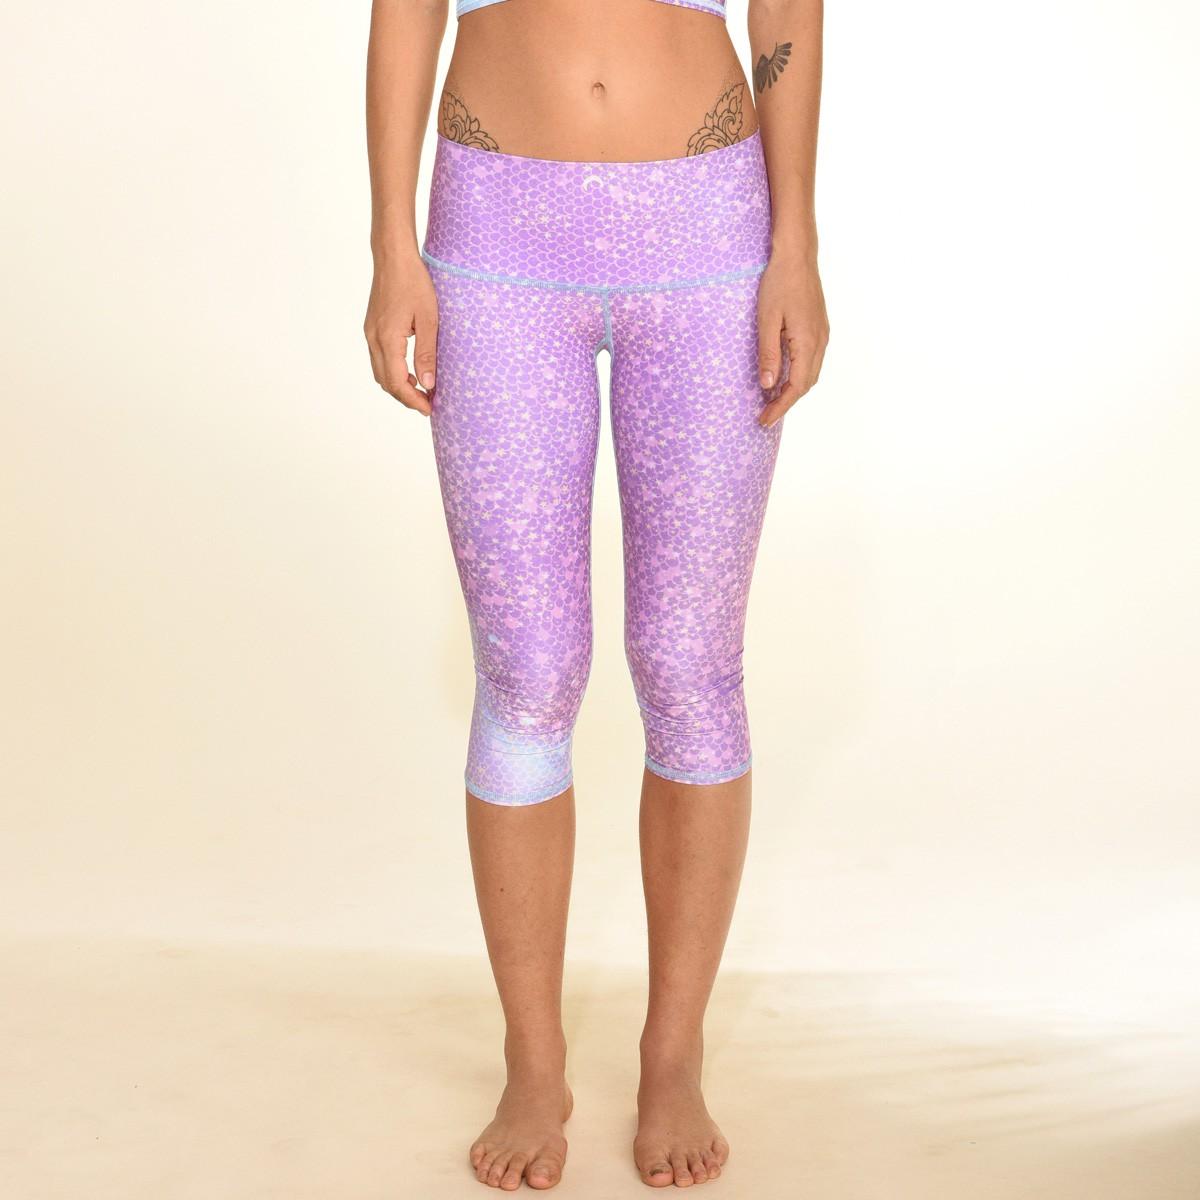 teeki mermaid fairyqueen lavender goddess capri am summerfield